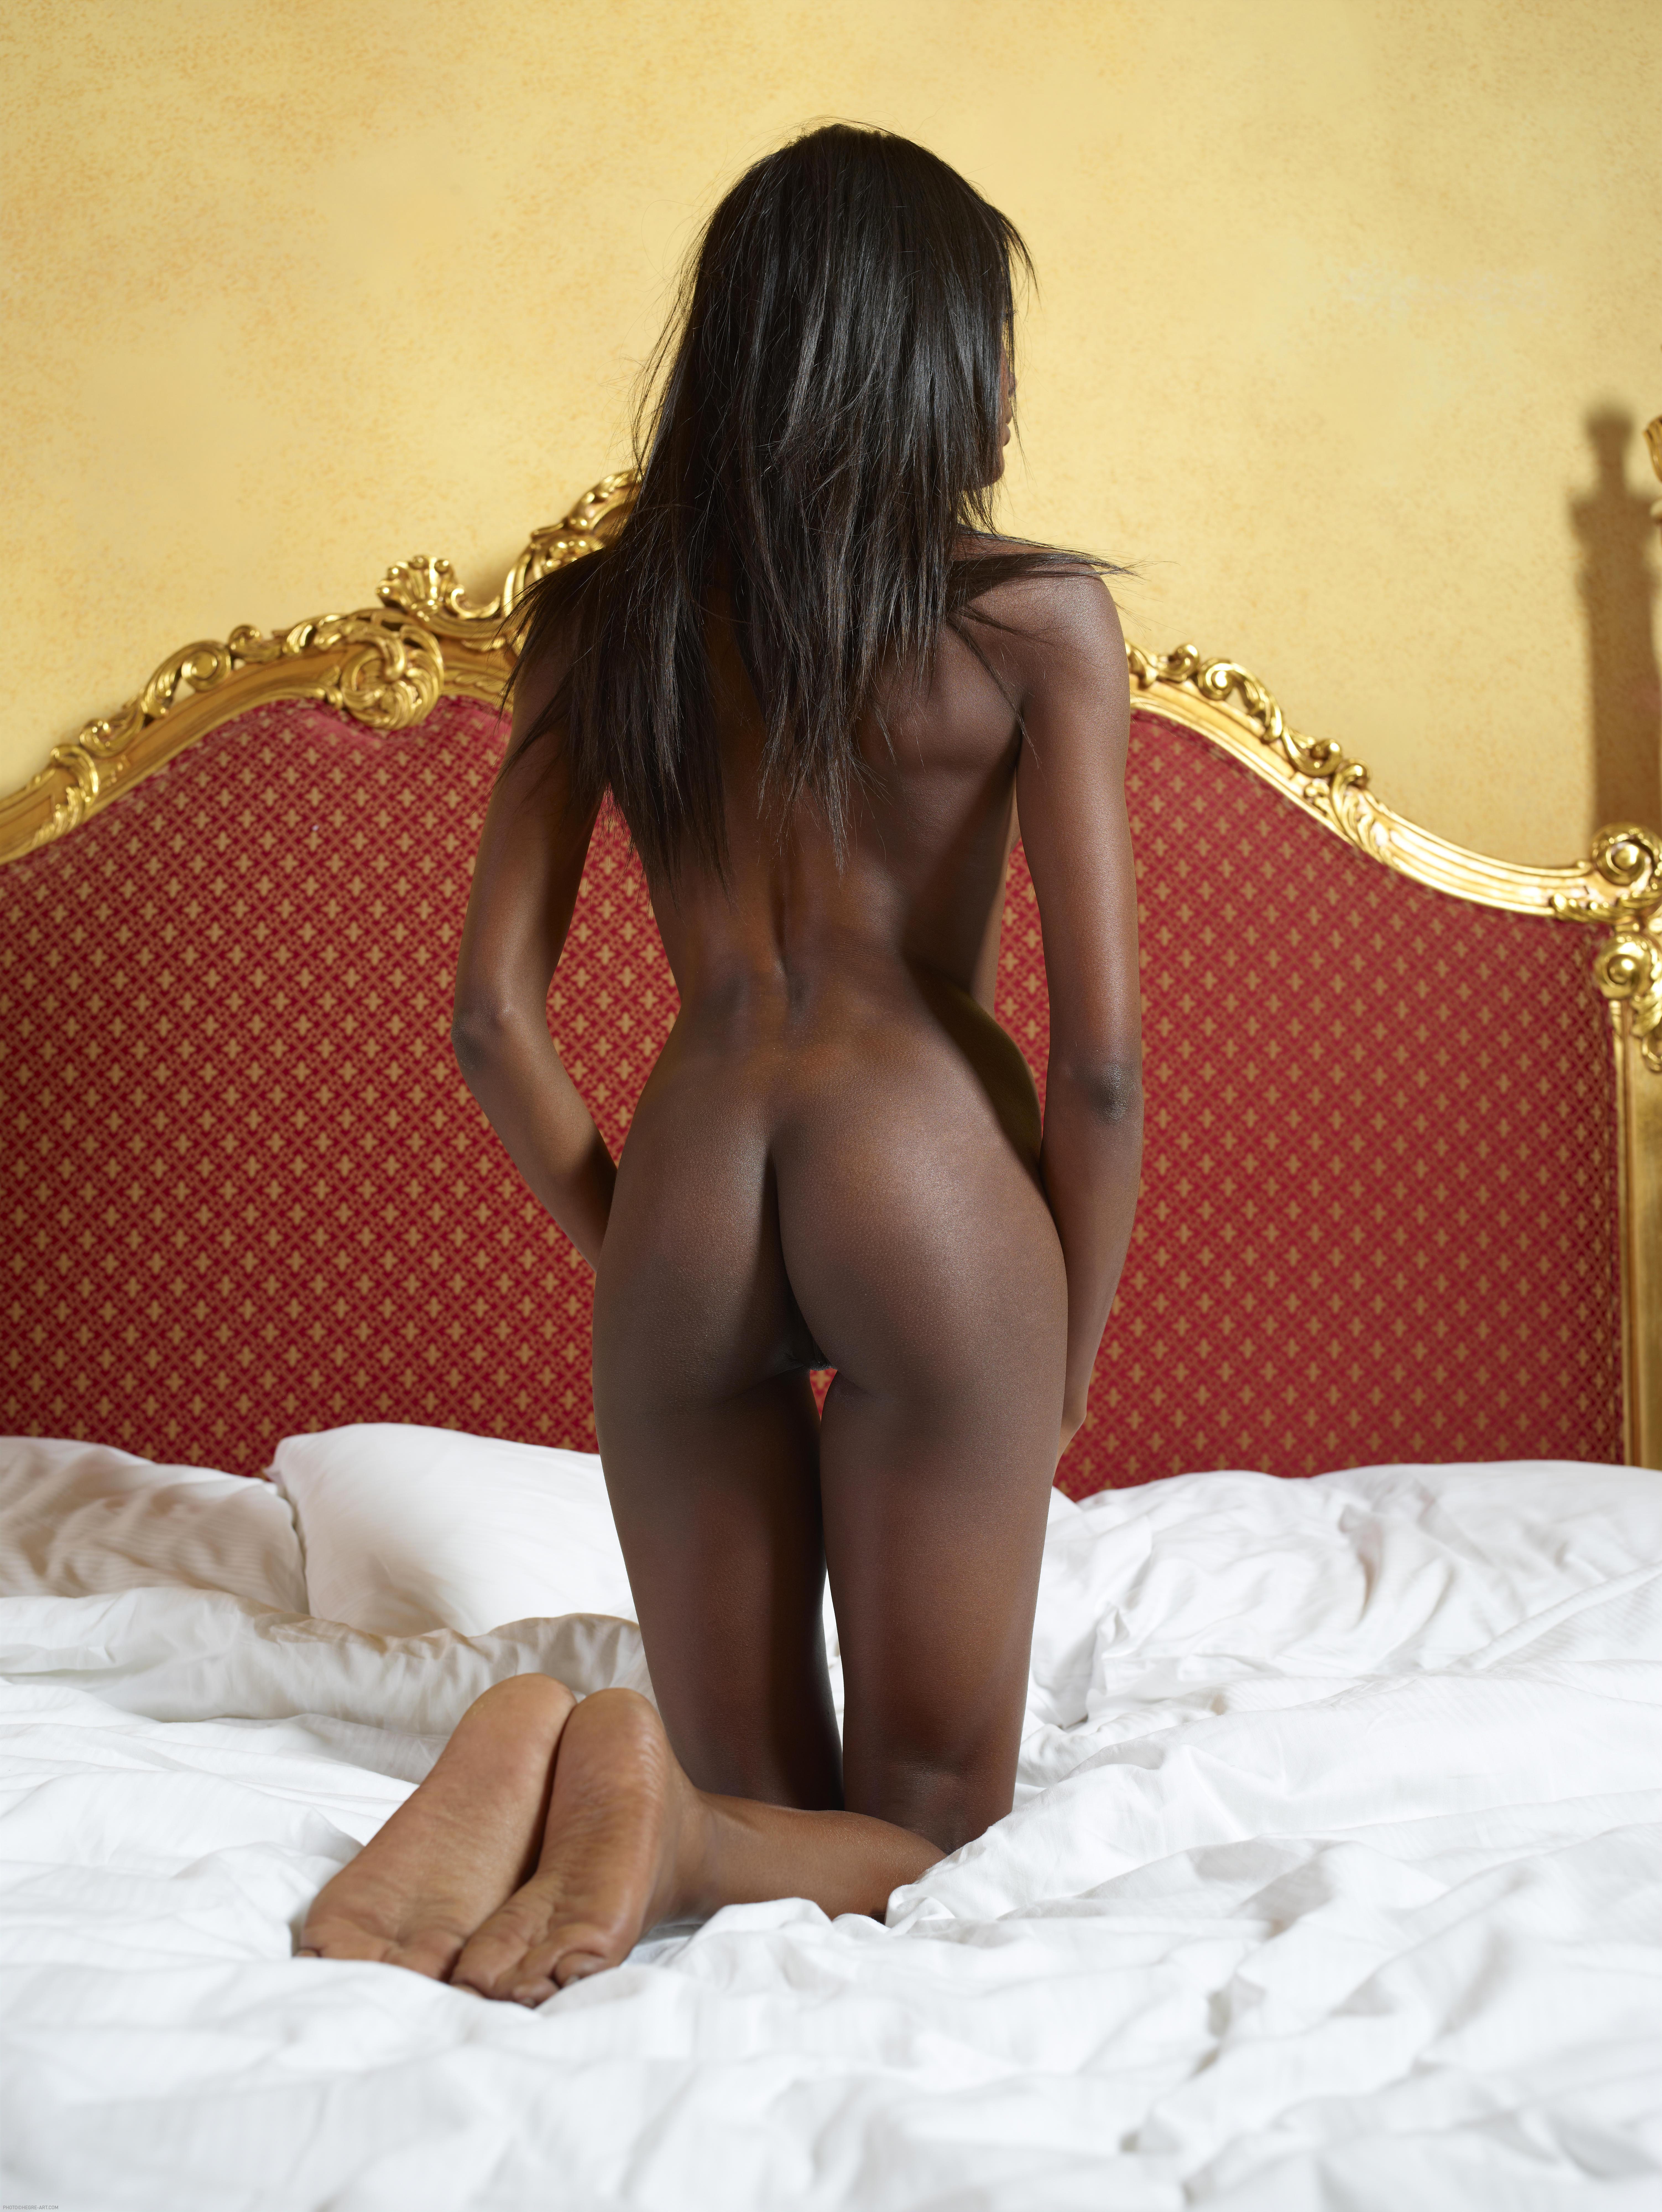 black girls twerking hot nude